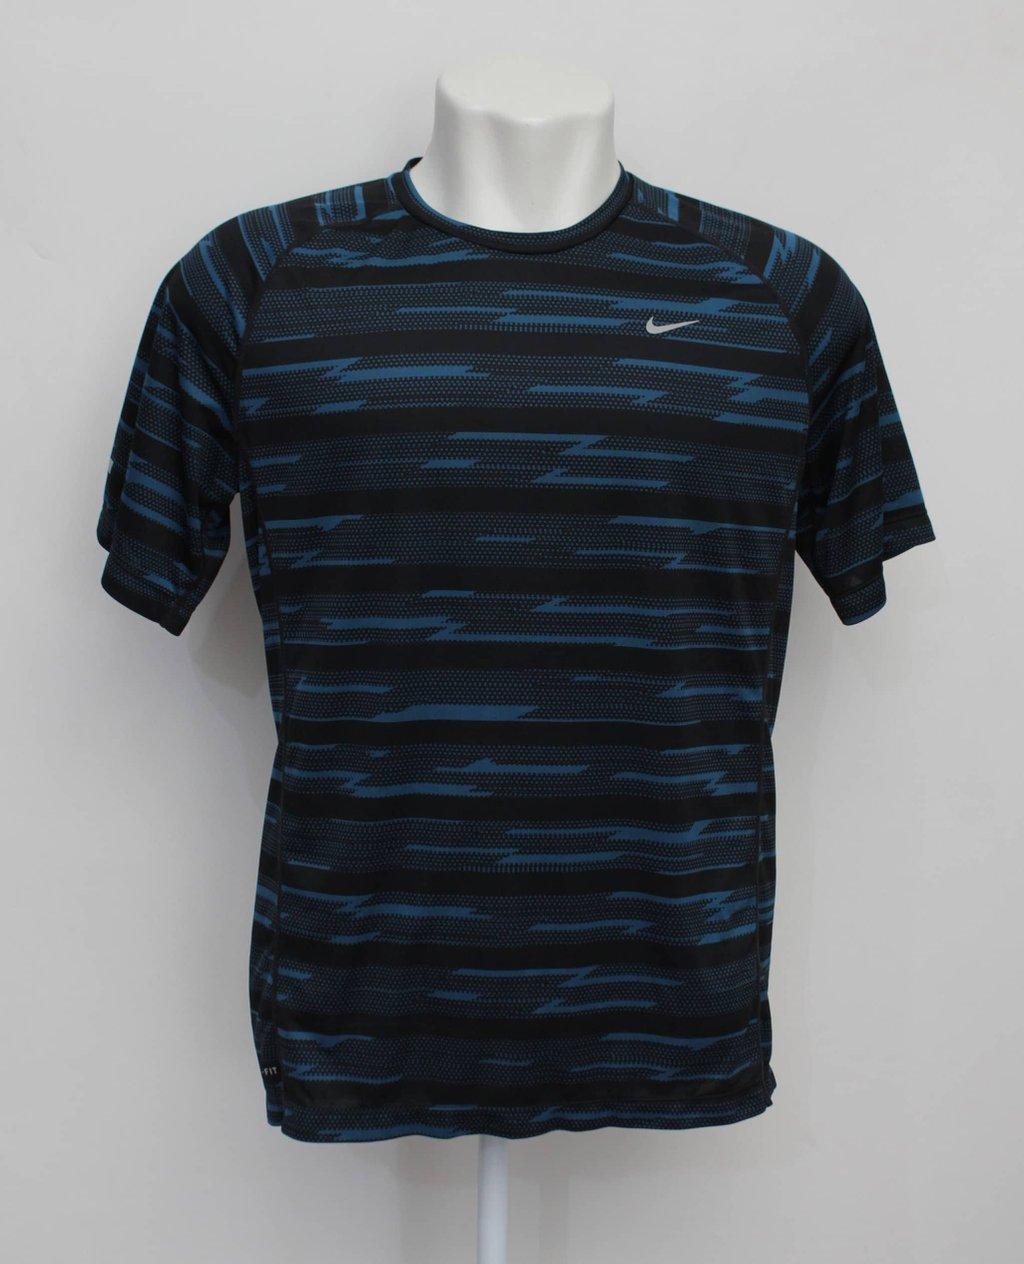 Rebobinar arco milicia  Camiseta nike masculina estampada - compre por menos | Repassa